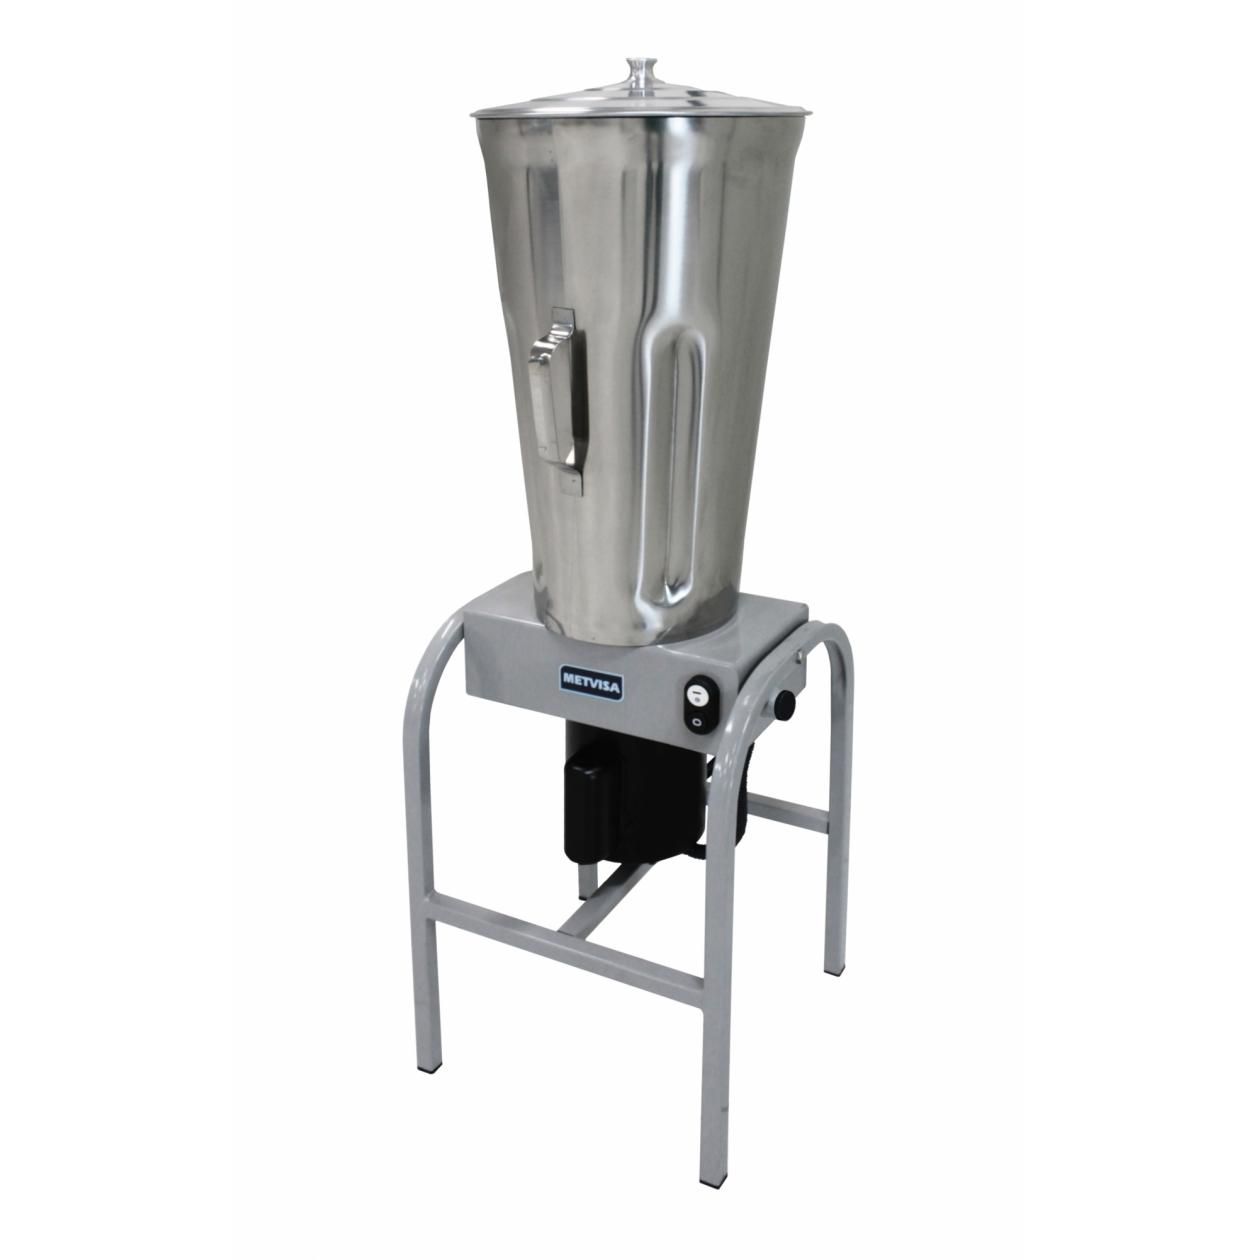 Liquidificador Industrial 25 L Baixa Rotação Inox Metvisa